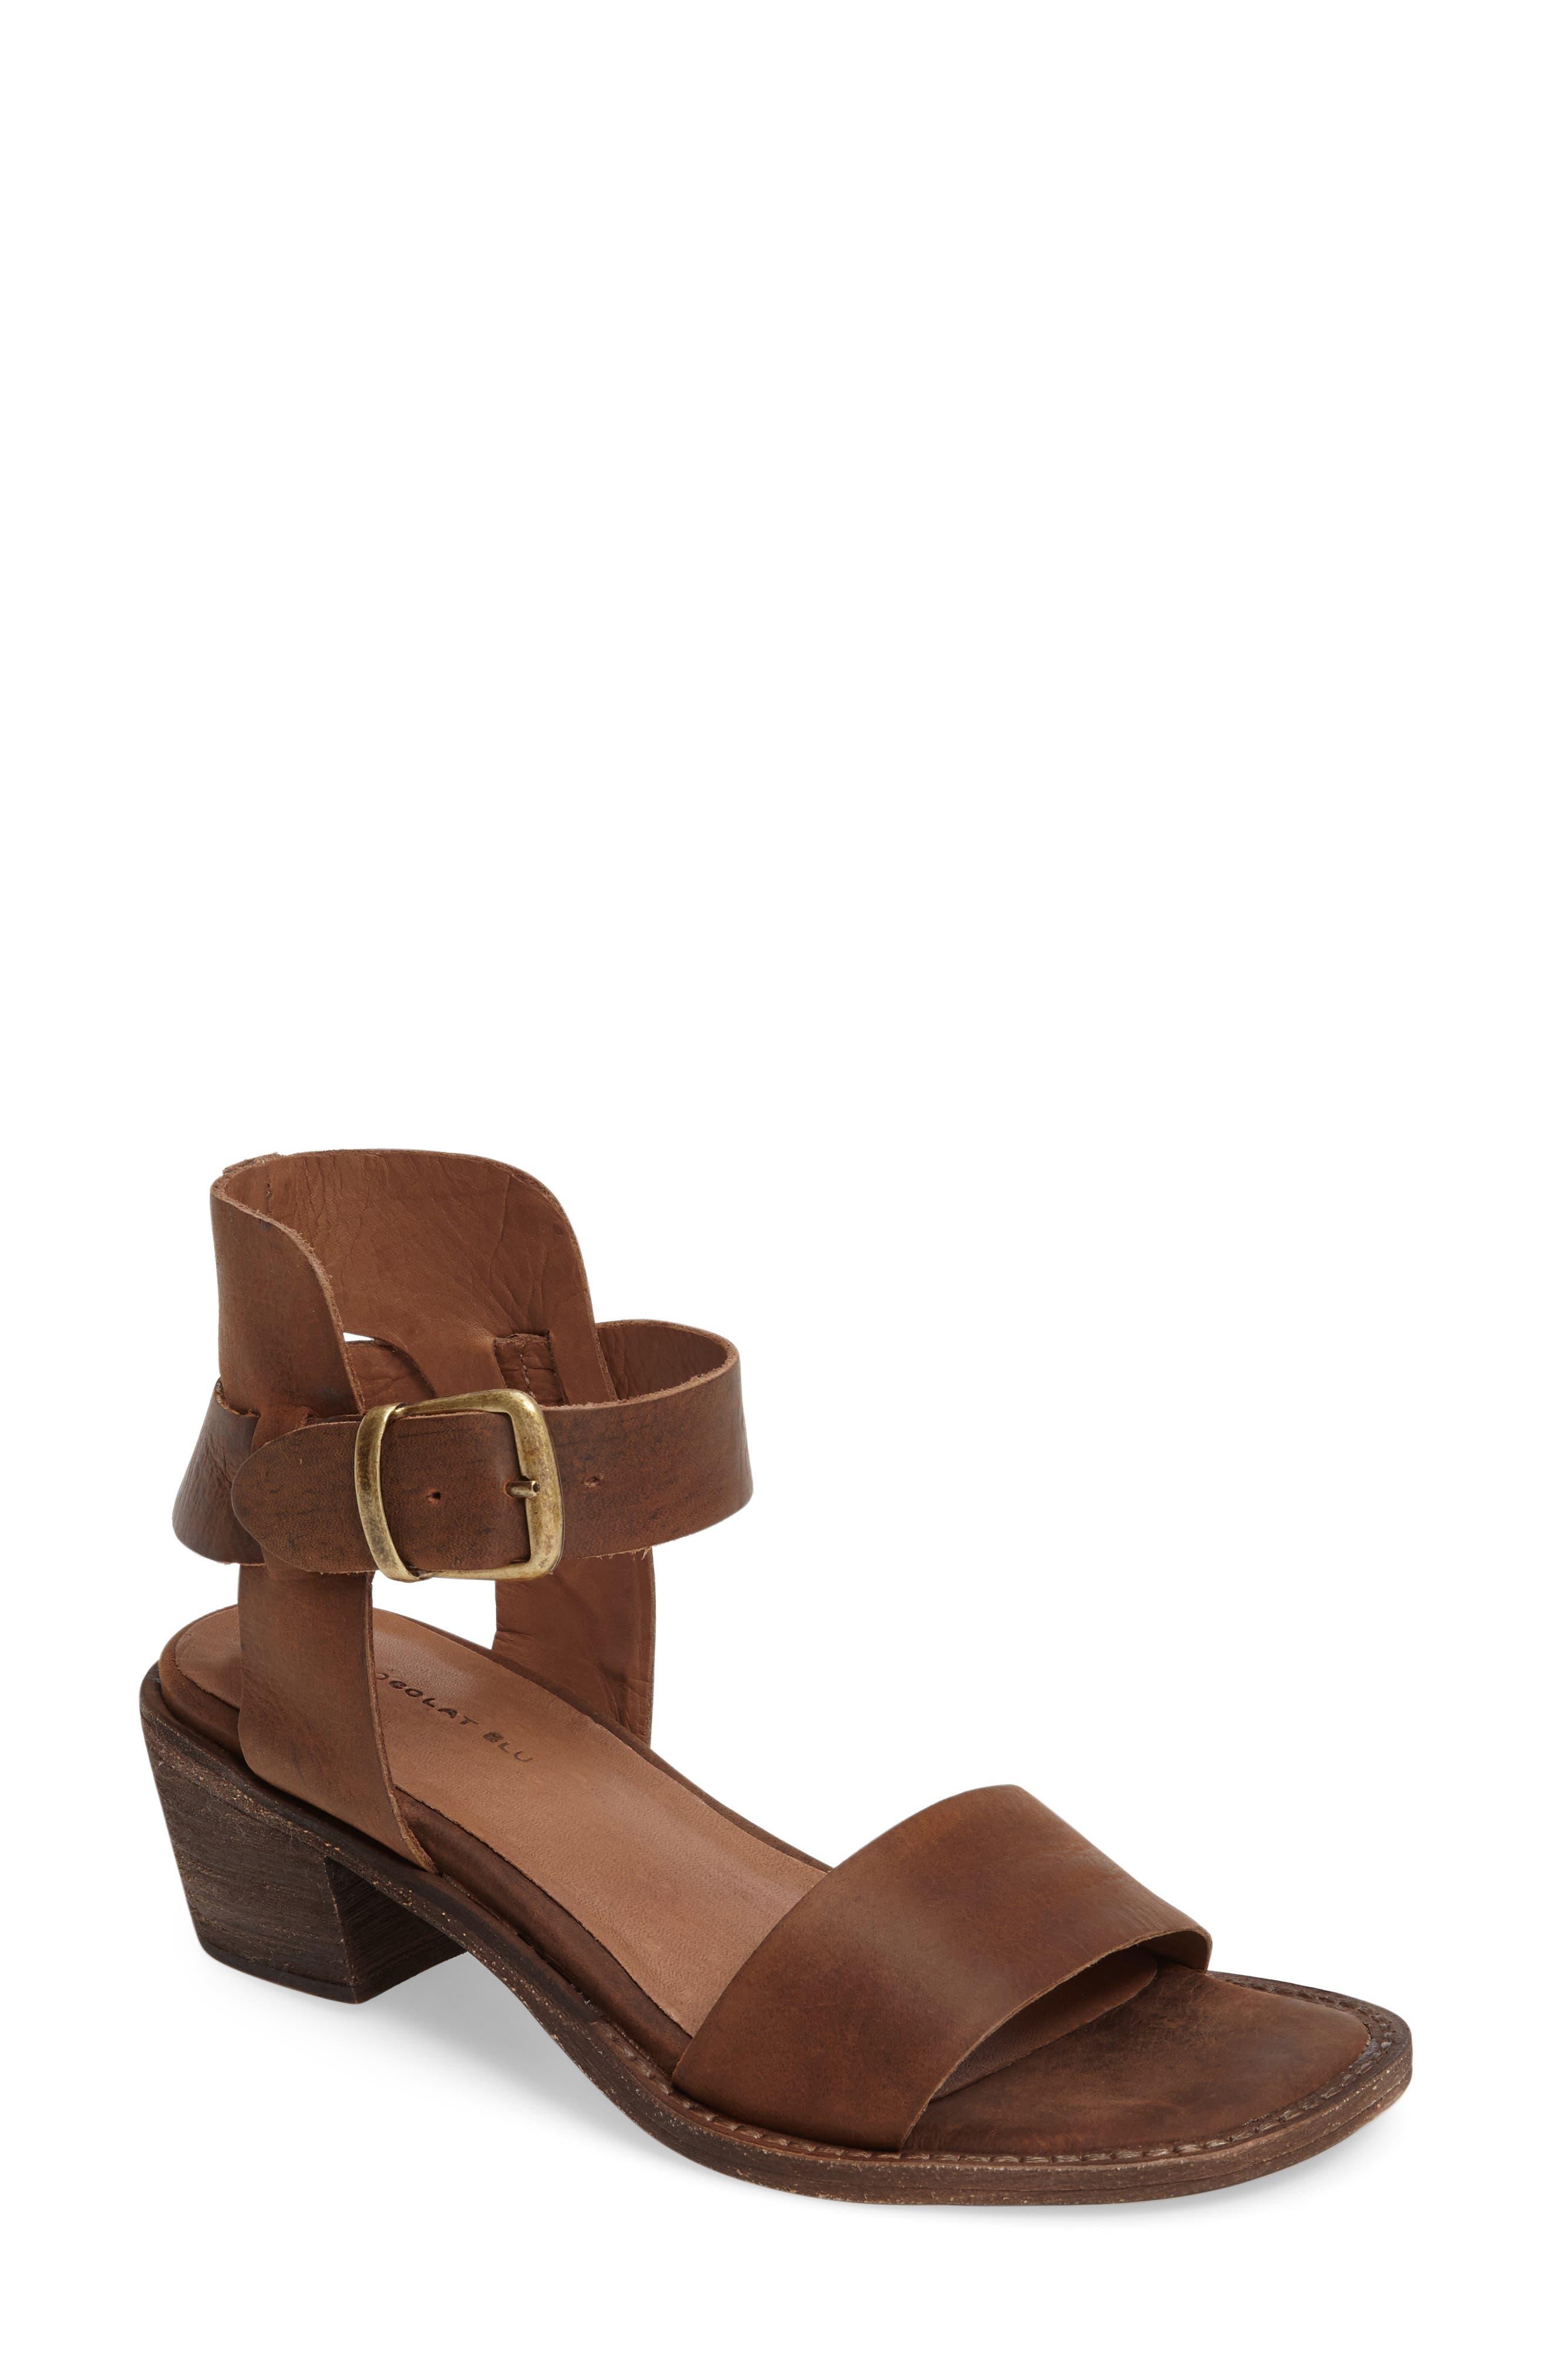 Alternate Image 1 Selected - Chocolat Blu Arcadia Block Heel Sandal (Women)